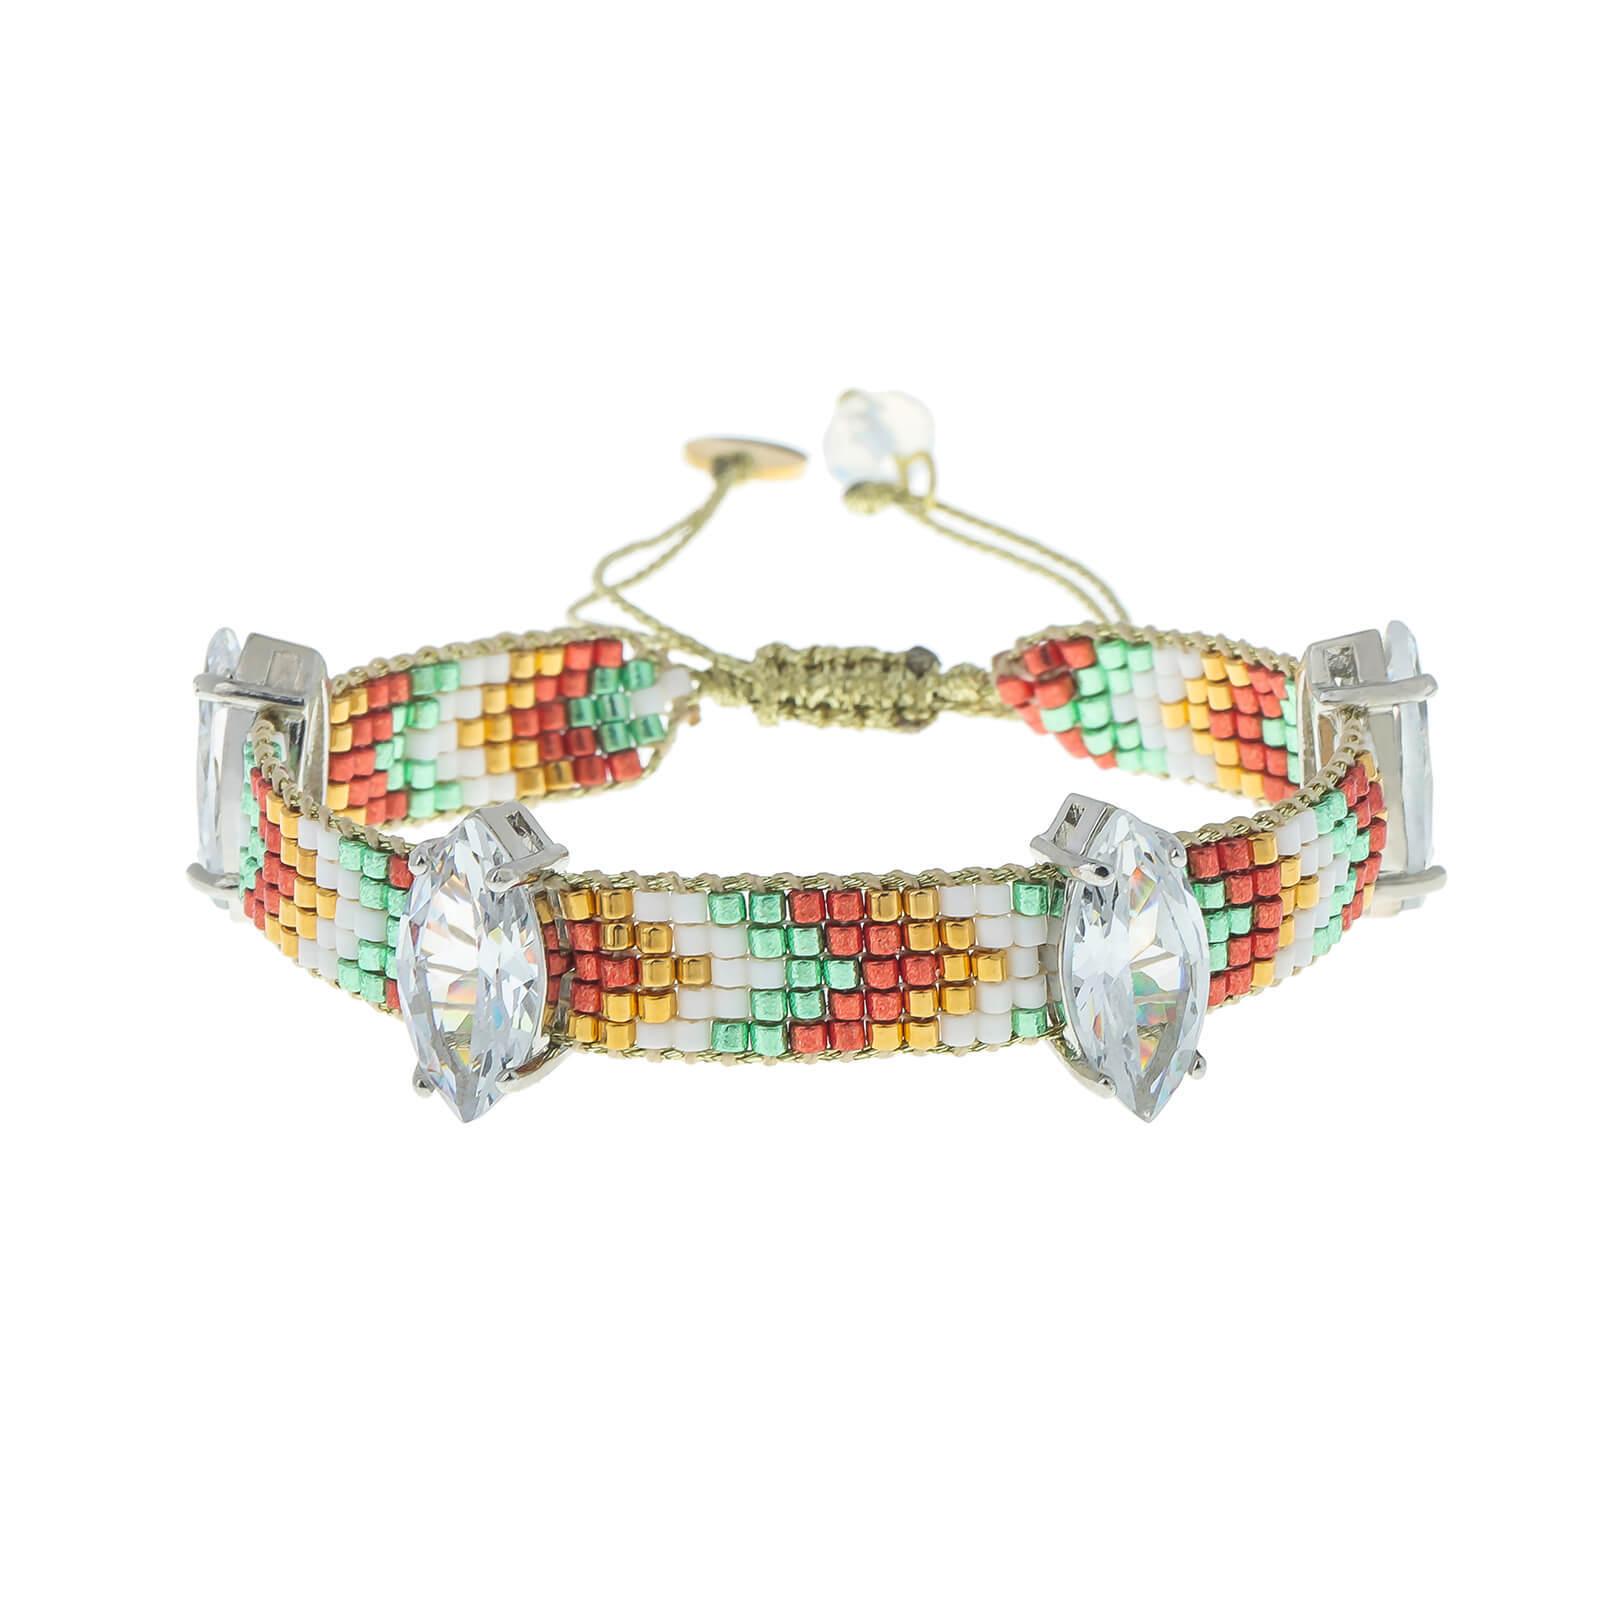 Horse eye Miyuki delica bead bracelet for women